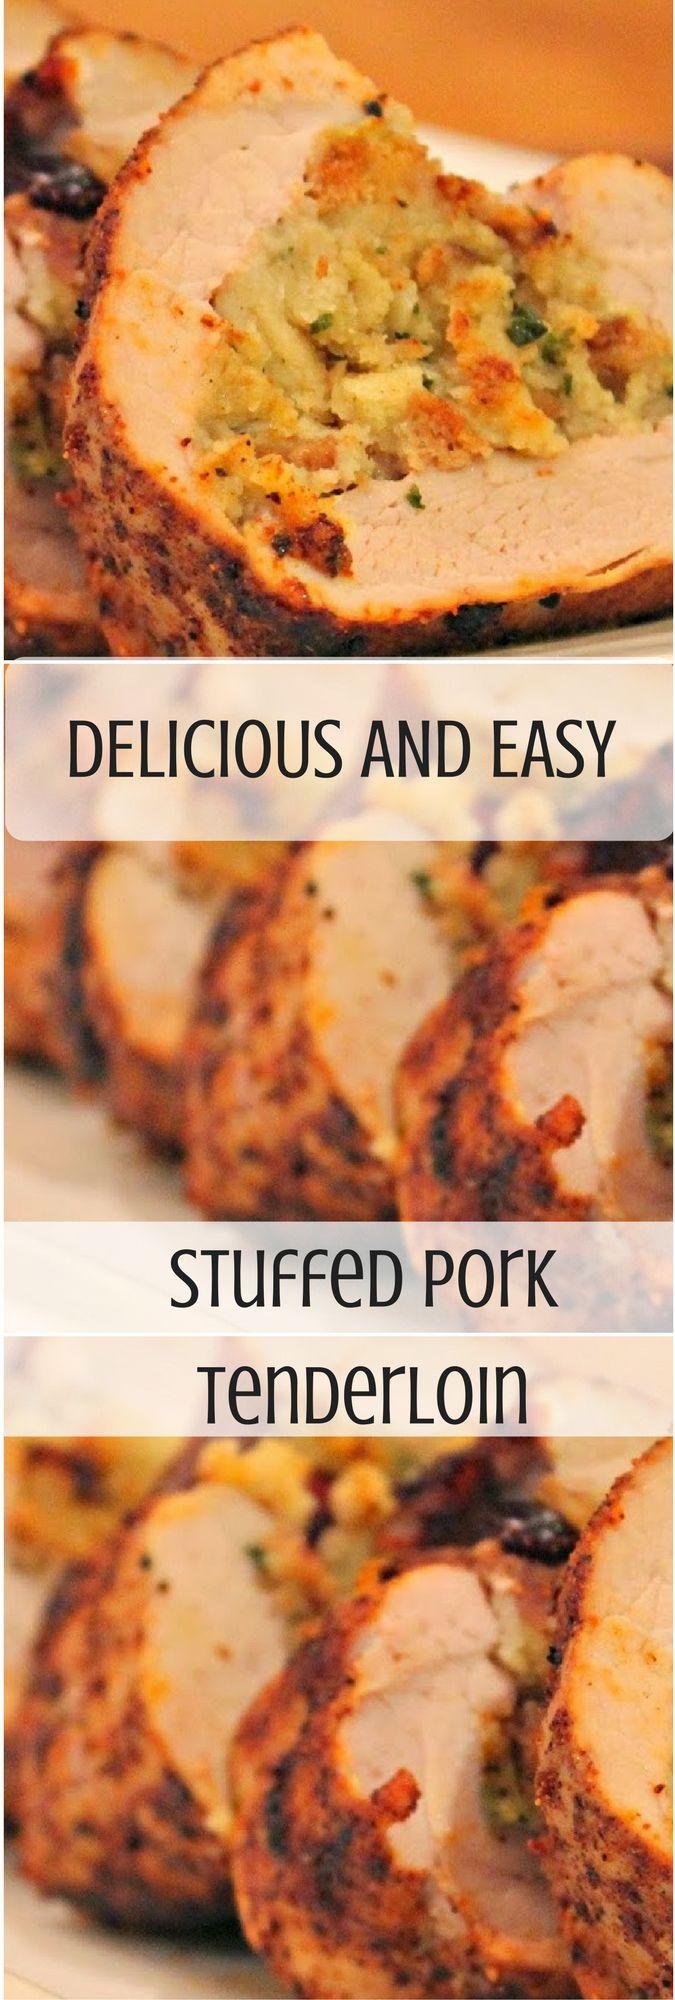 pork loin recipes | stuffed pork tenderloin | family friendly recipes | pork tenderloin | dinner recipes |